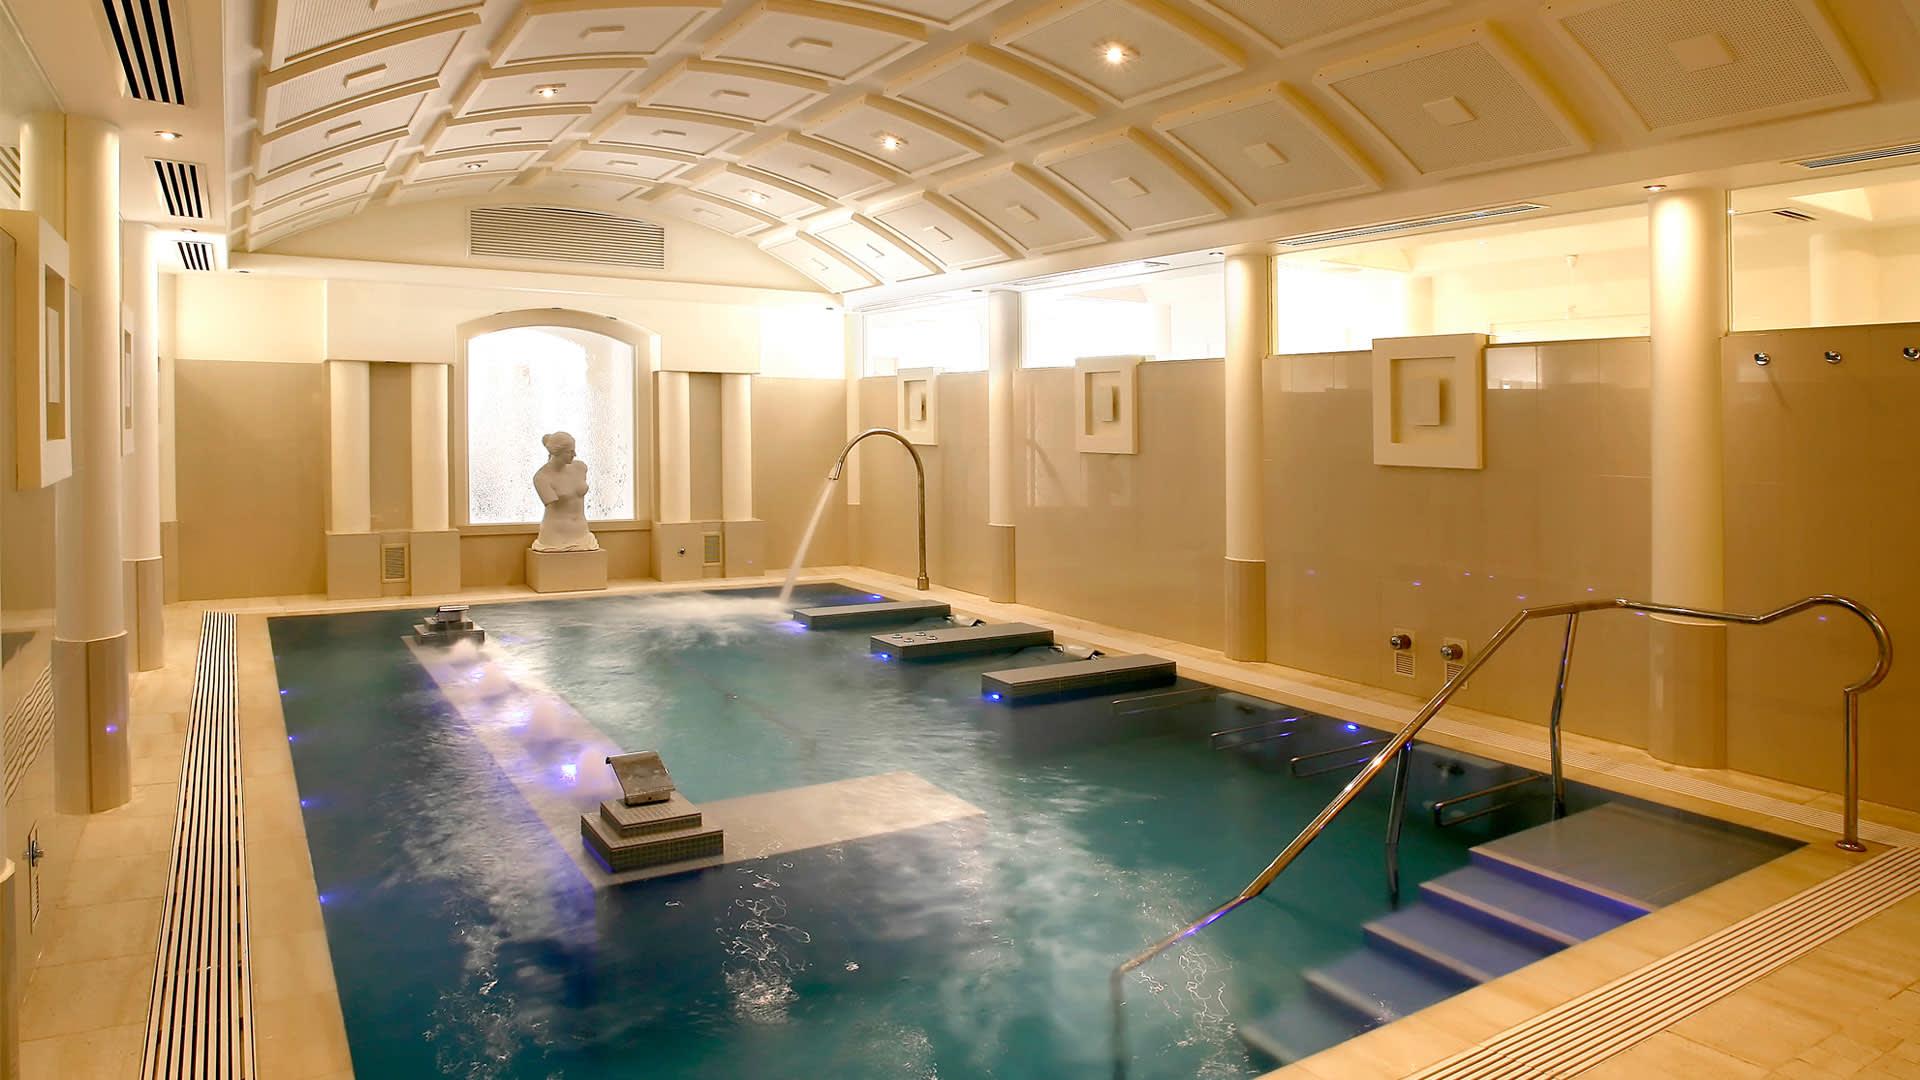 8 luxurious spas to treat yourself to on the Sunshine Coast